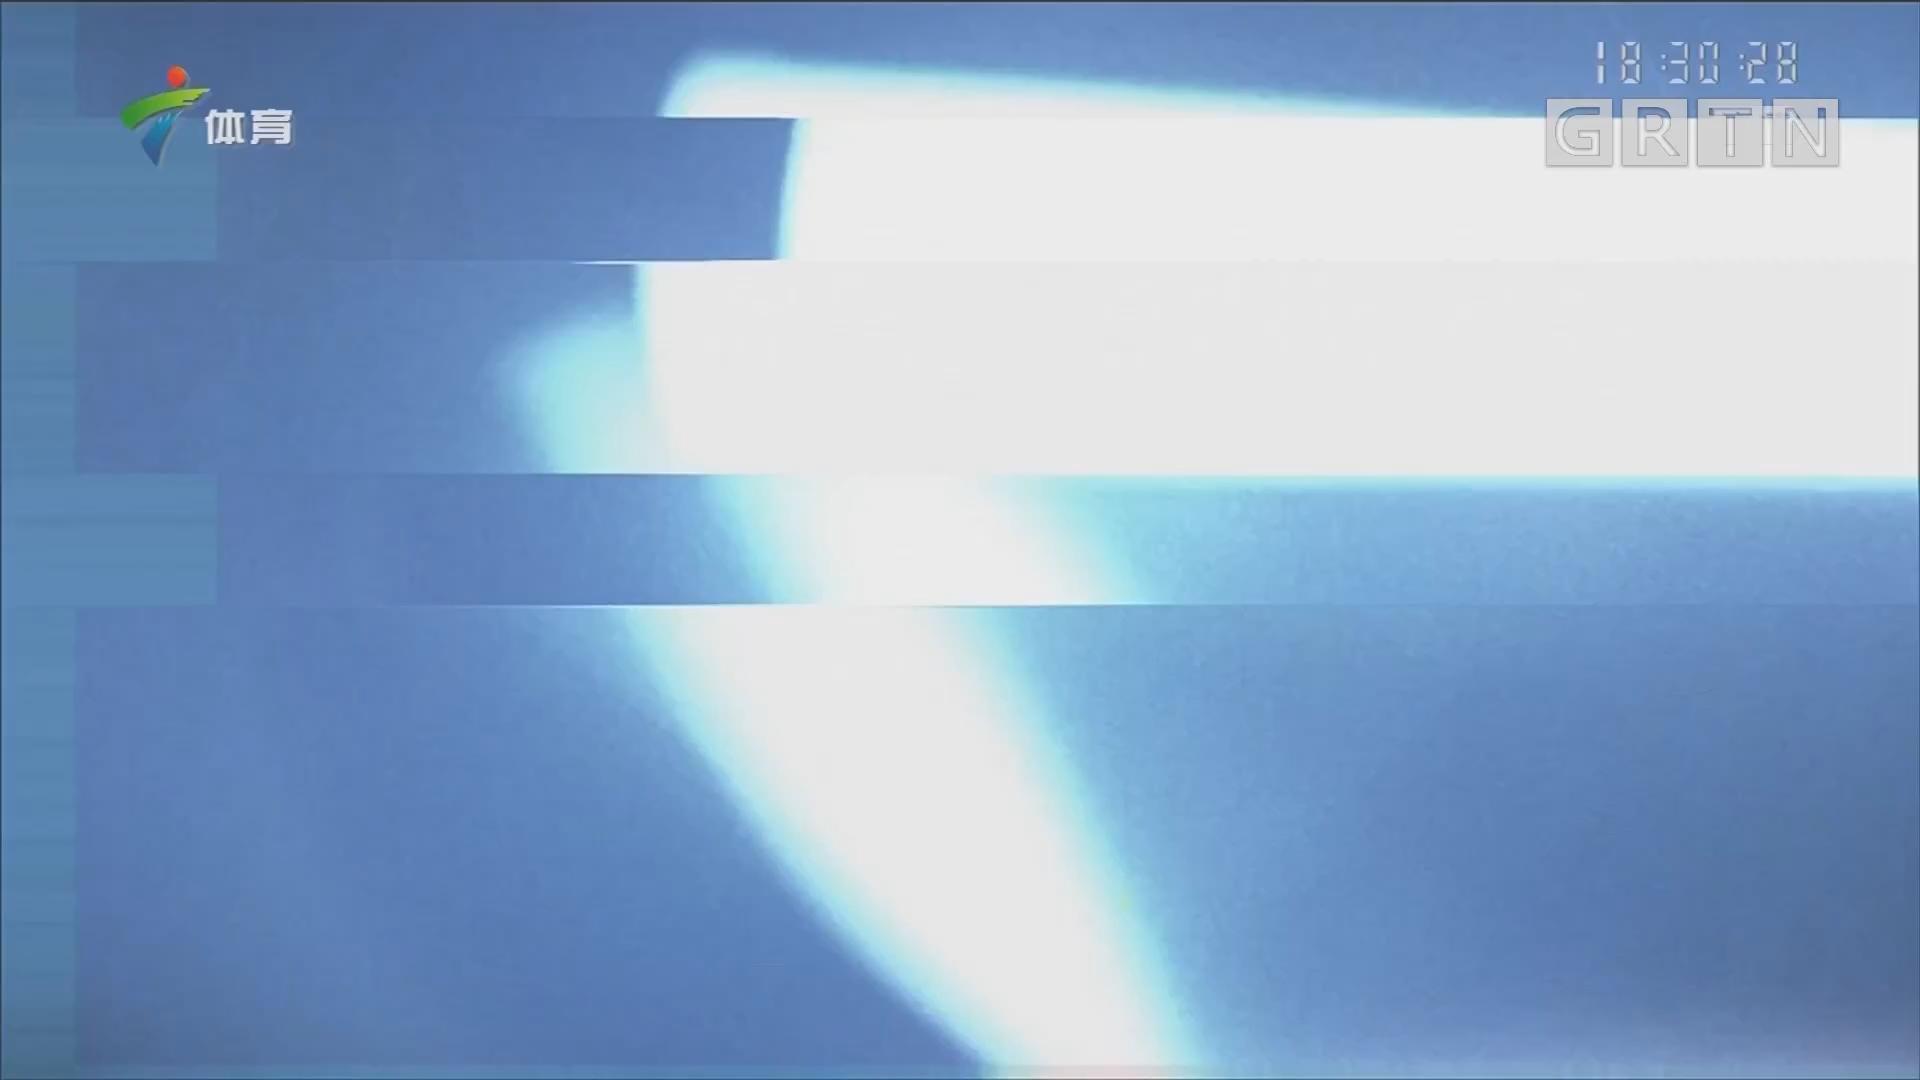 [HD][2019-08-18]体育世界:广东田径小花:颜值担当却更实力出众